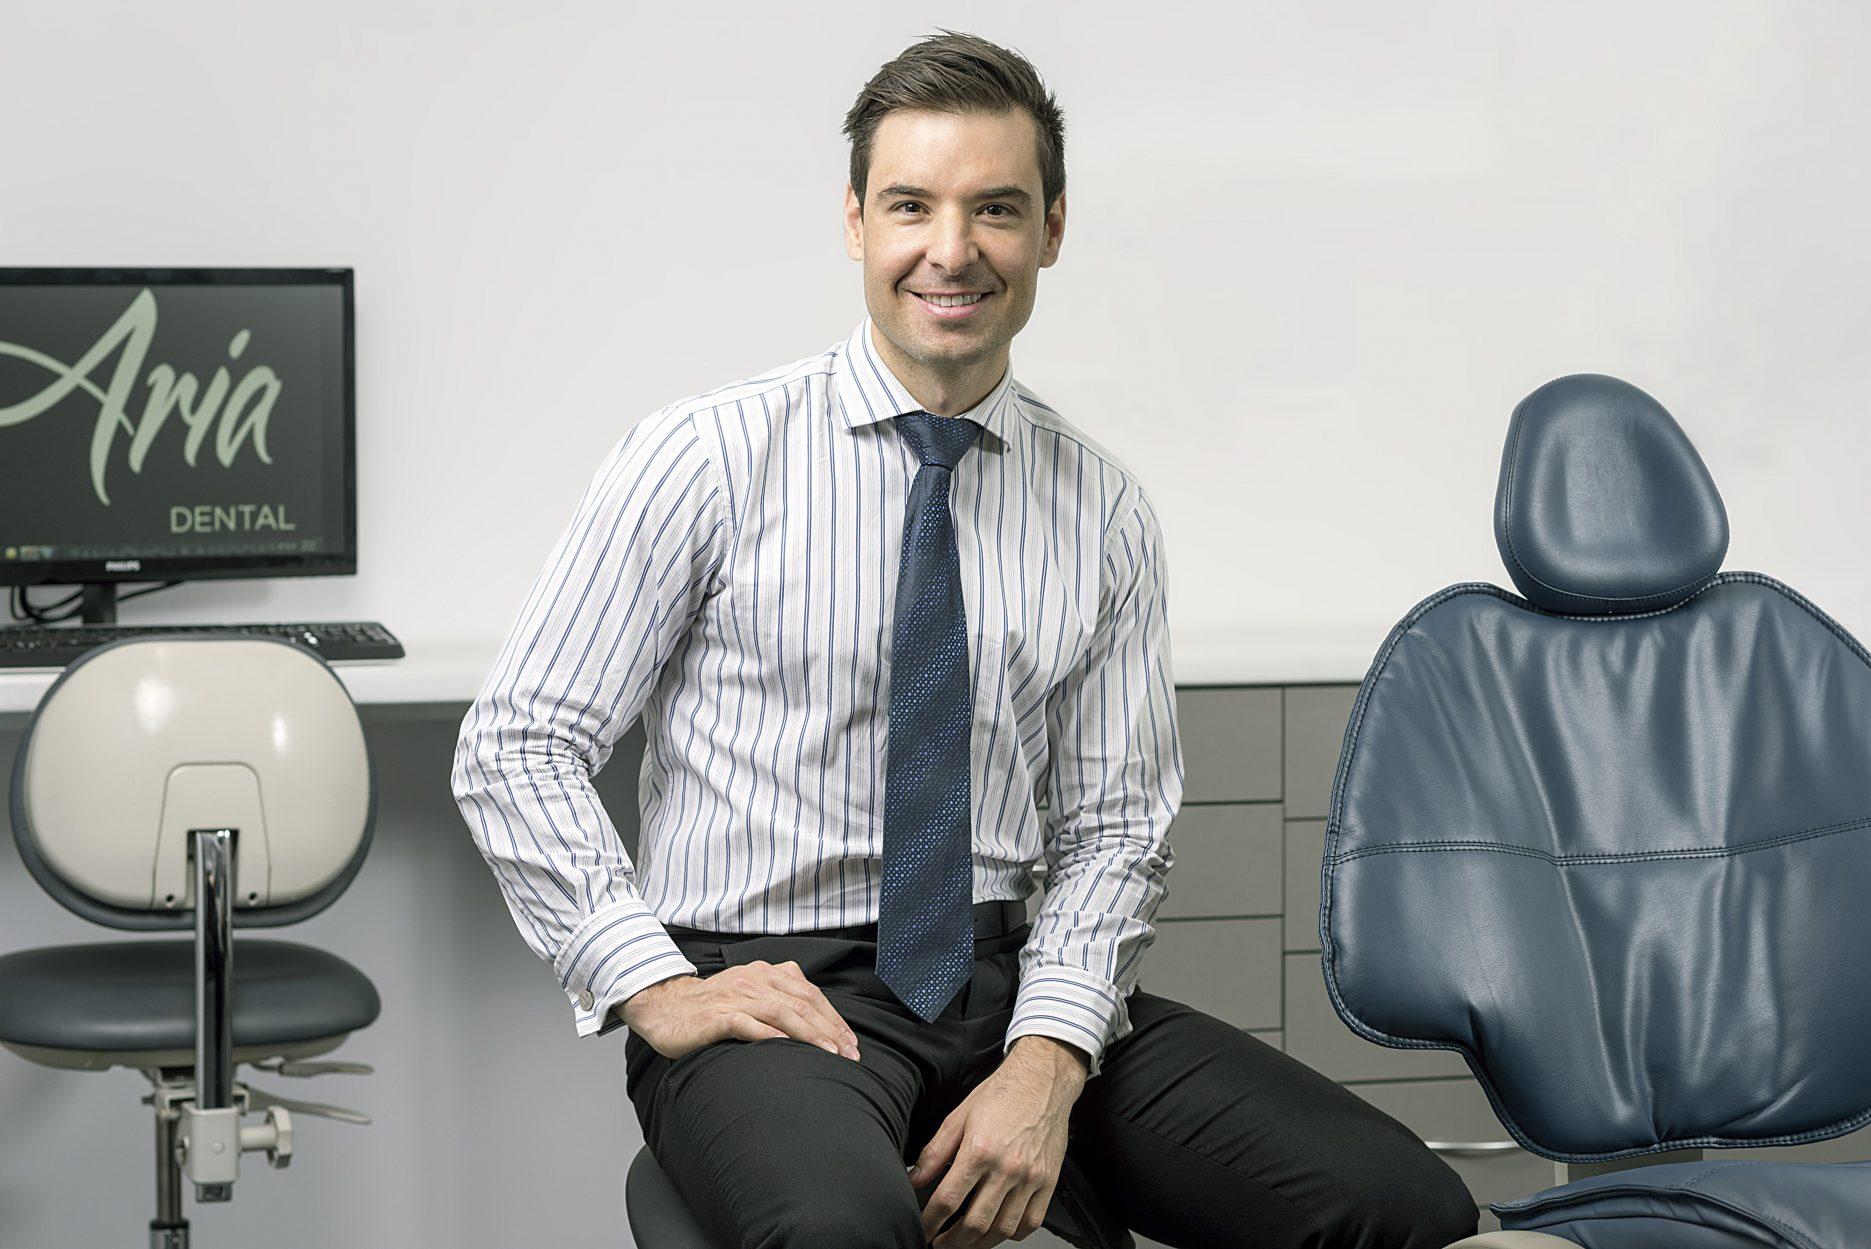 Specialist Prosthodontist Dr Michael Zaninovich